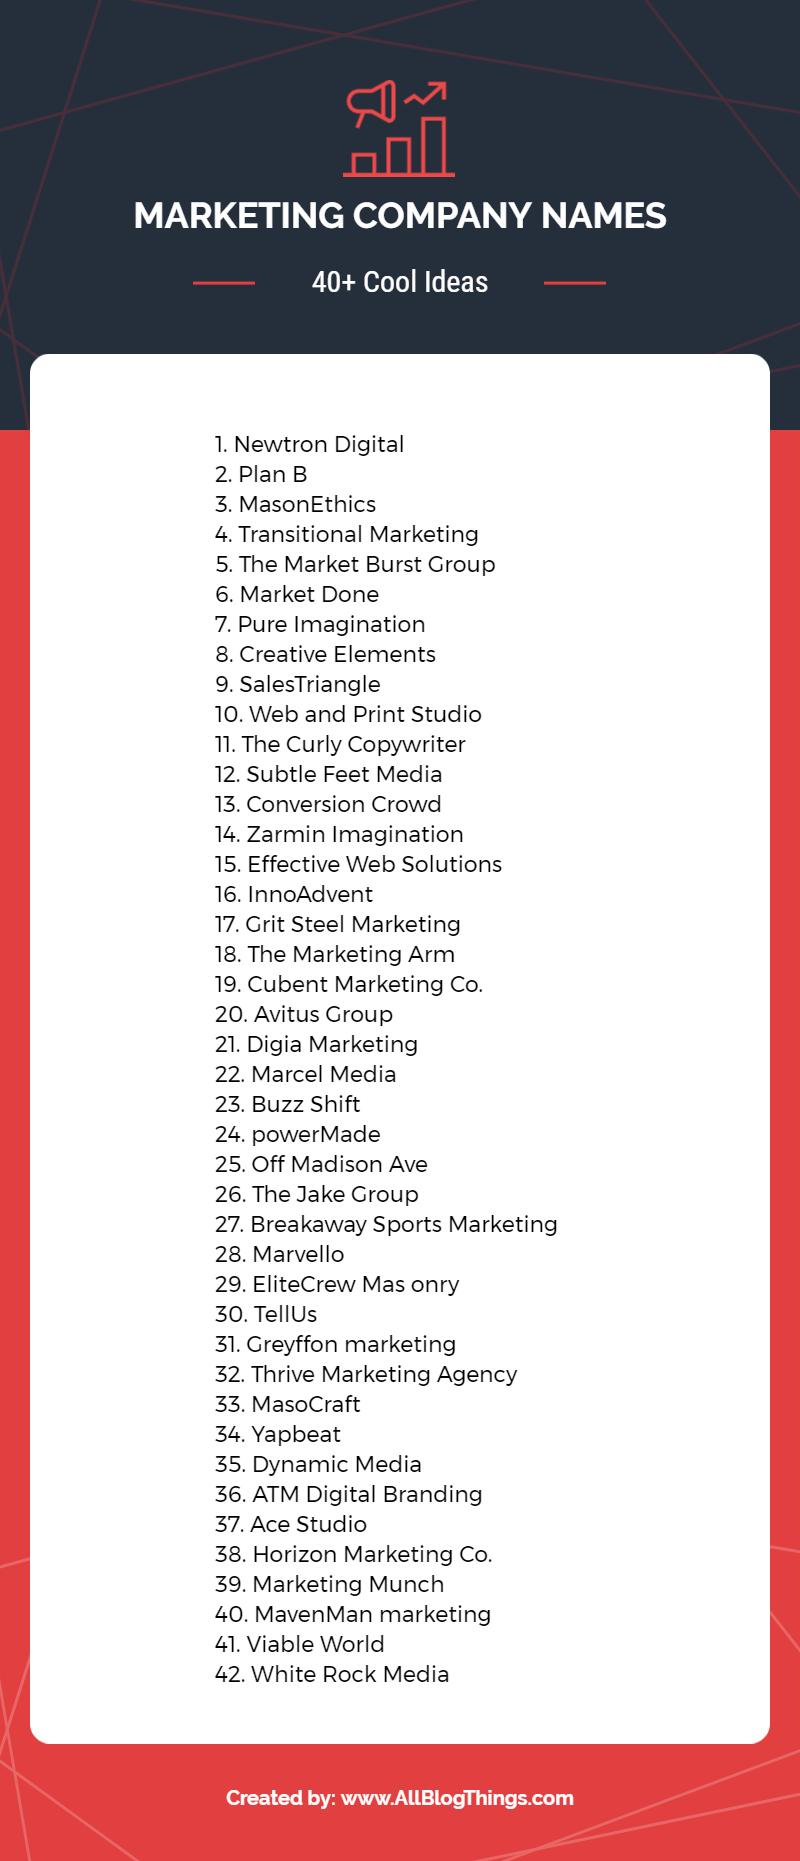 Marketing Company Names Infographic